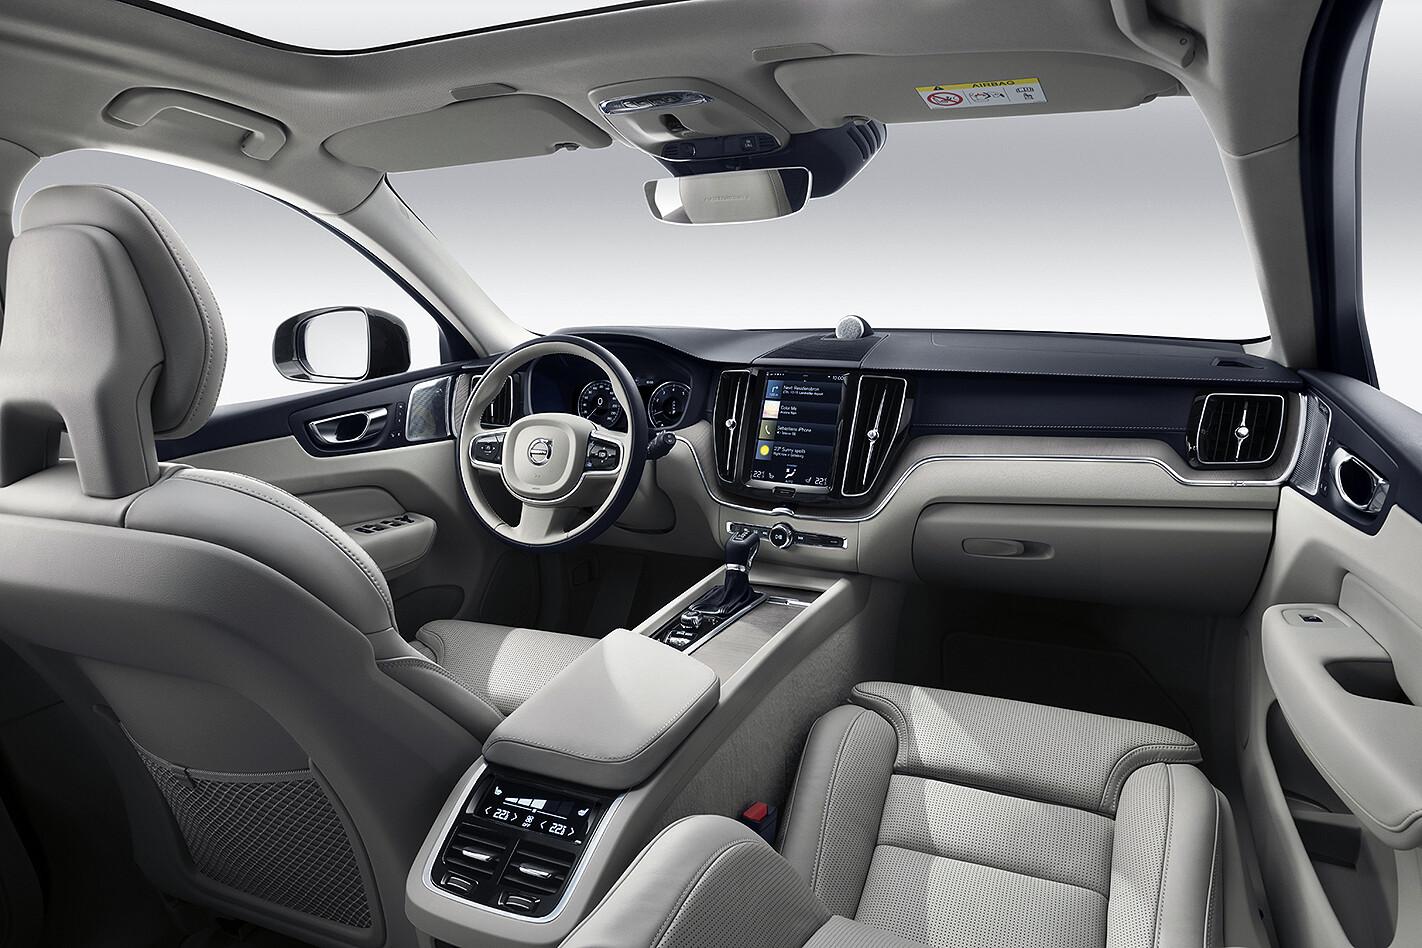 2018 volvo XC60 interior